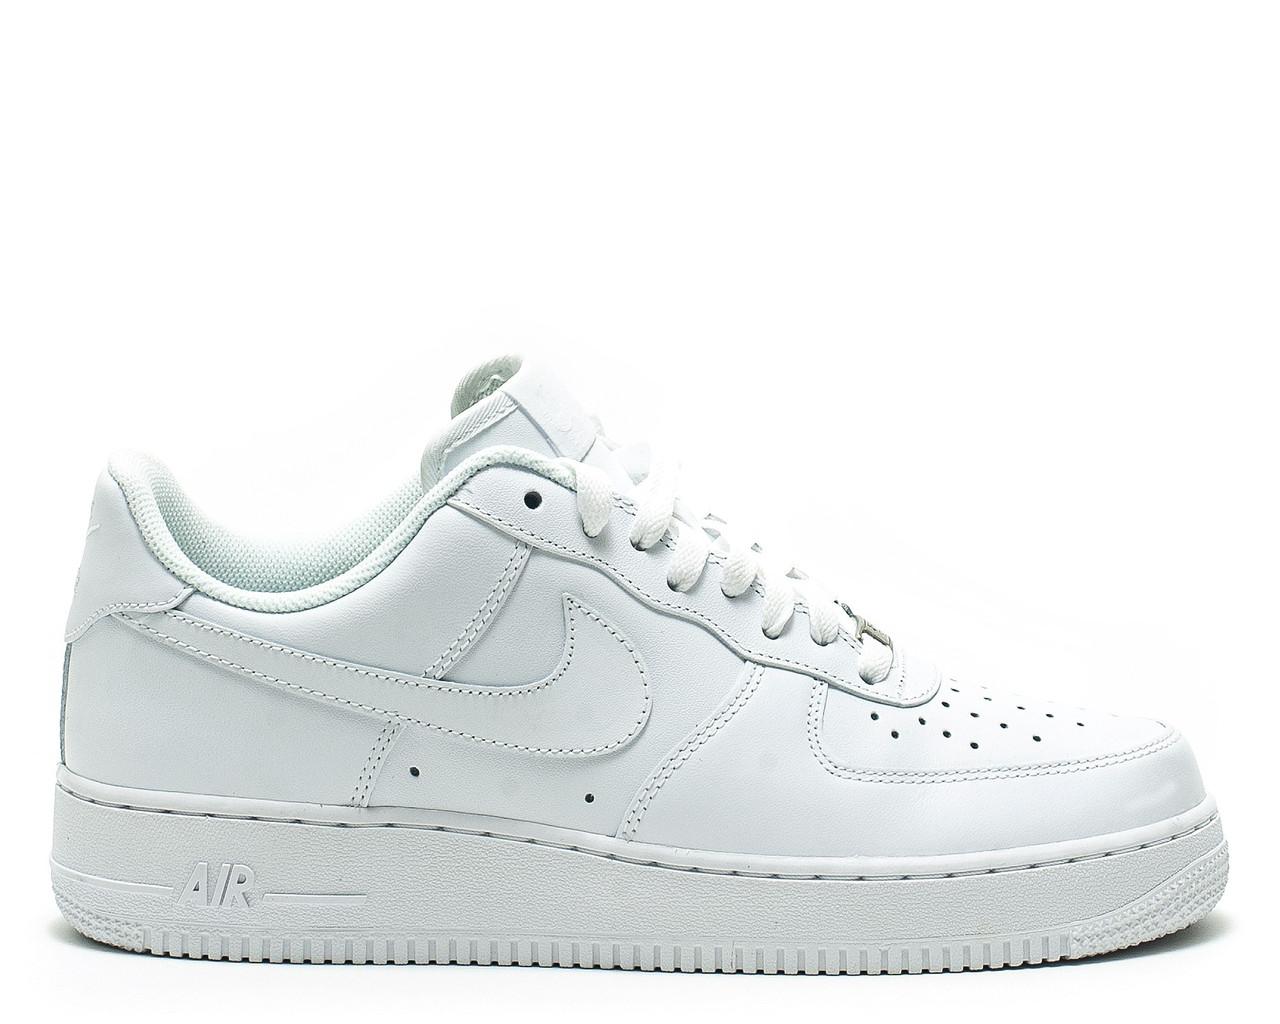 ... Кроссовки Air Force 1 White Оригинал Nike мужские Найк Аир Форс белые cdb2d915dfeb3